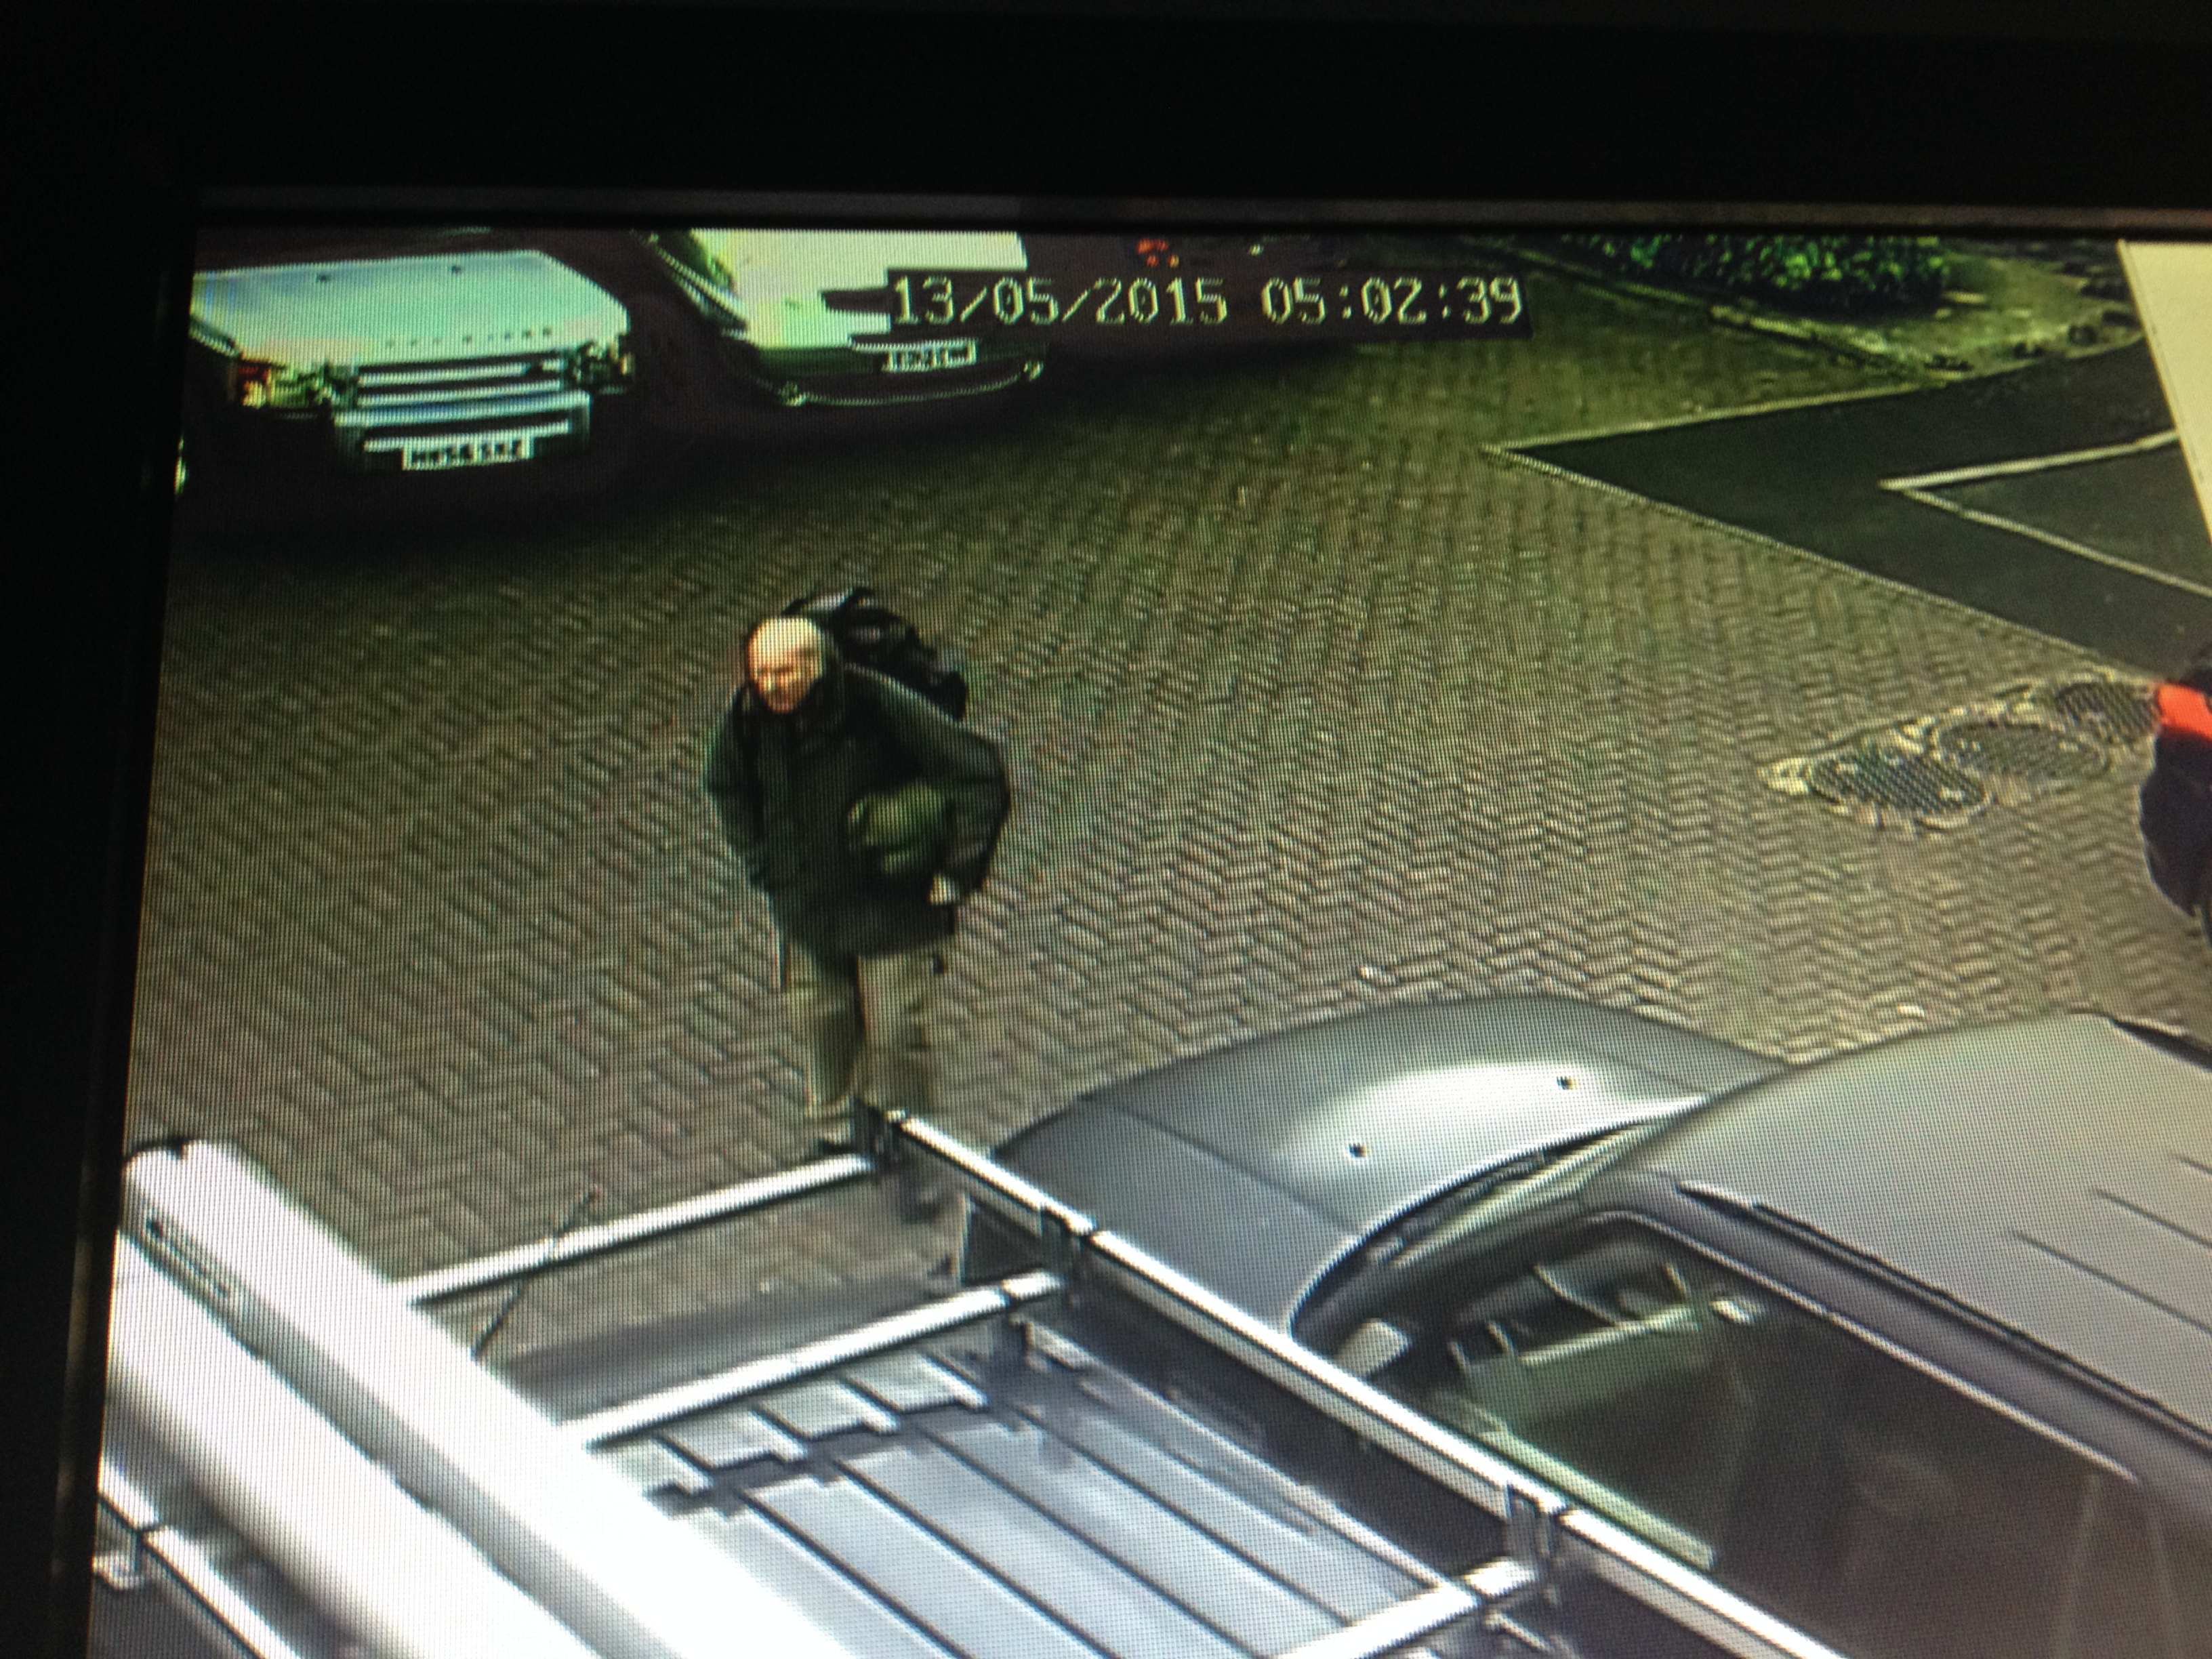 Stephen Rider CCTV